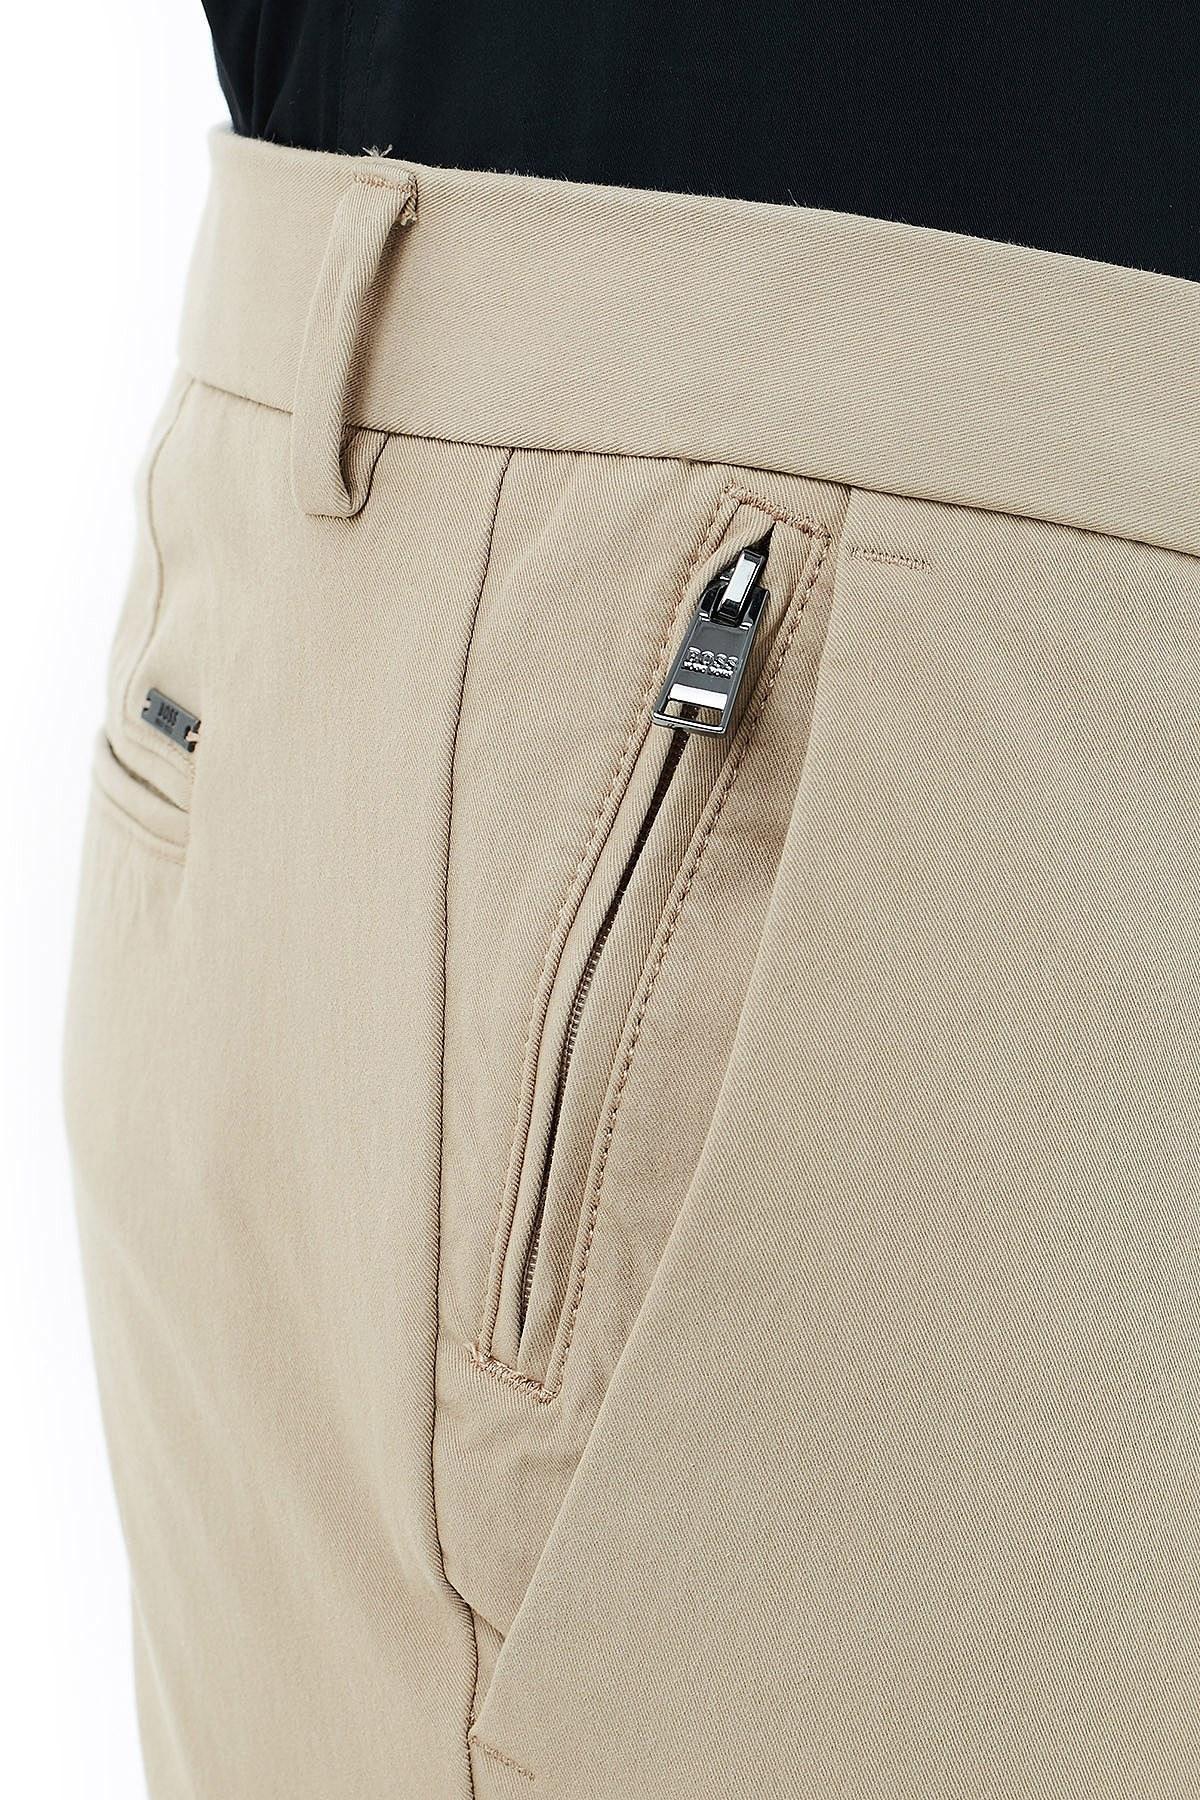 Hugo Boss Slim Fit Cepli Erkek Pantolon 50437895 275 AÇIK BEJ